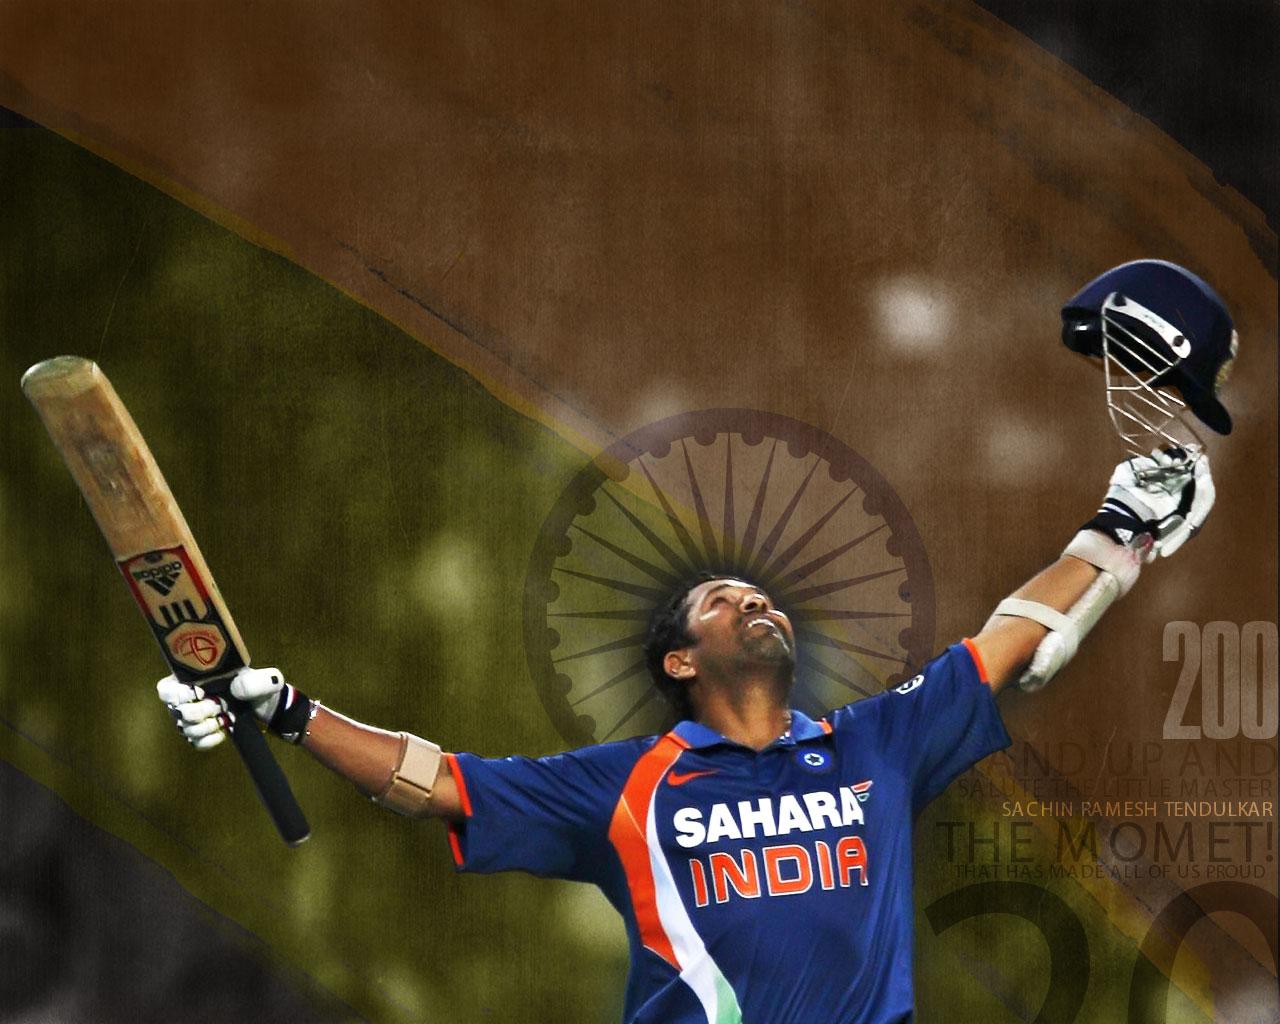 All Sports Players Sachin Tendulkar New HD Wallpapers 2012 2013